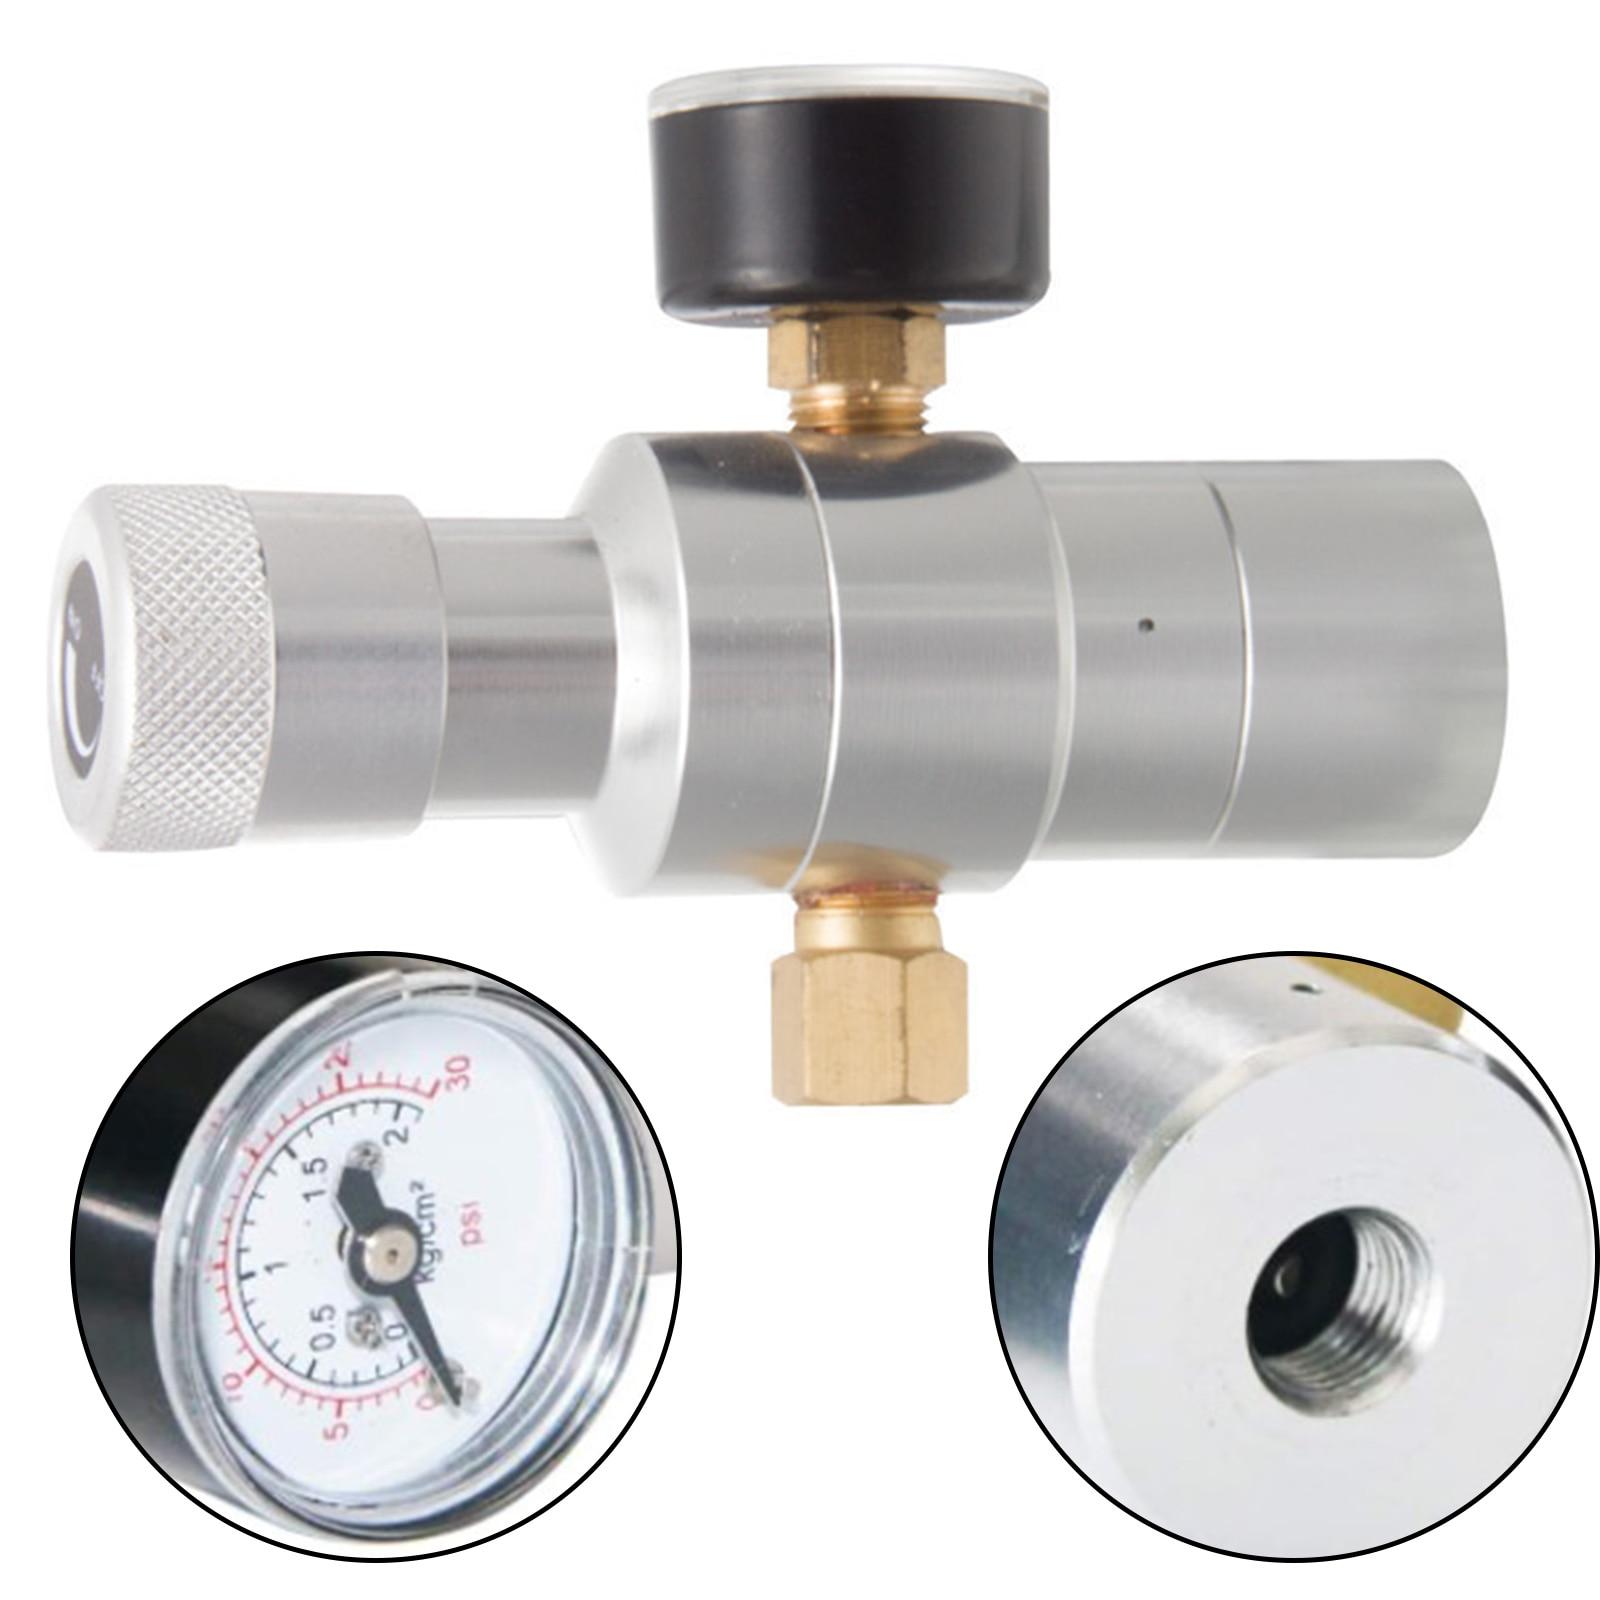 CO2 Regulator Includes Keg Regulator 0-30 PSI, 3/8